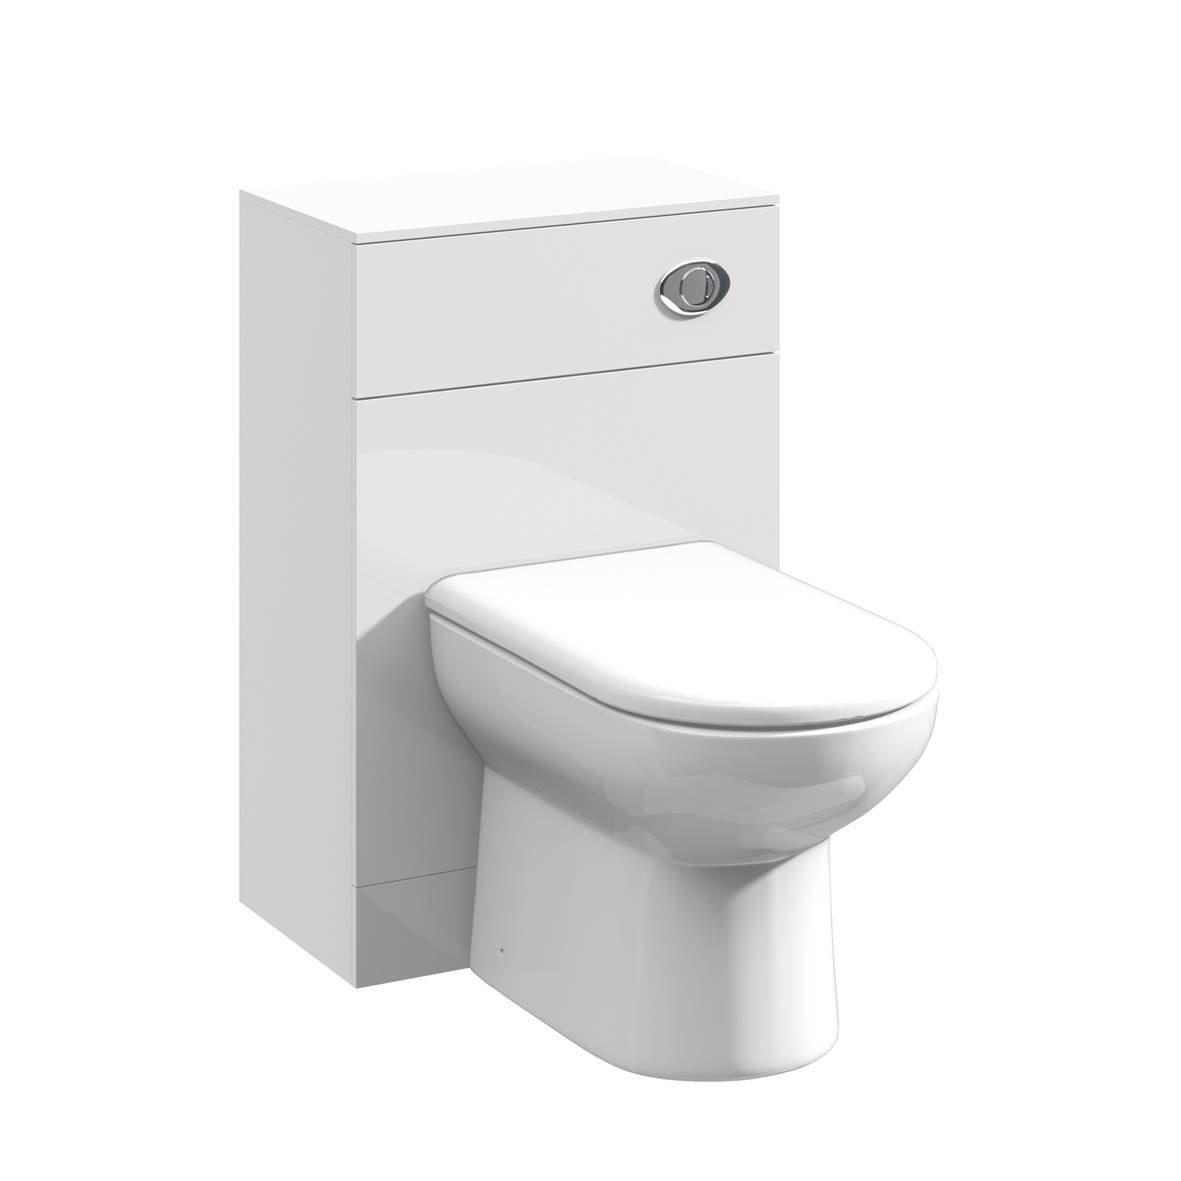 950mm Modular High Gloss White Bathroom Combination Vanity Basin ...